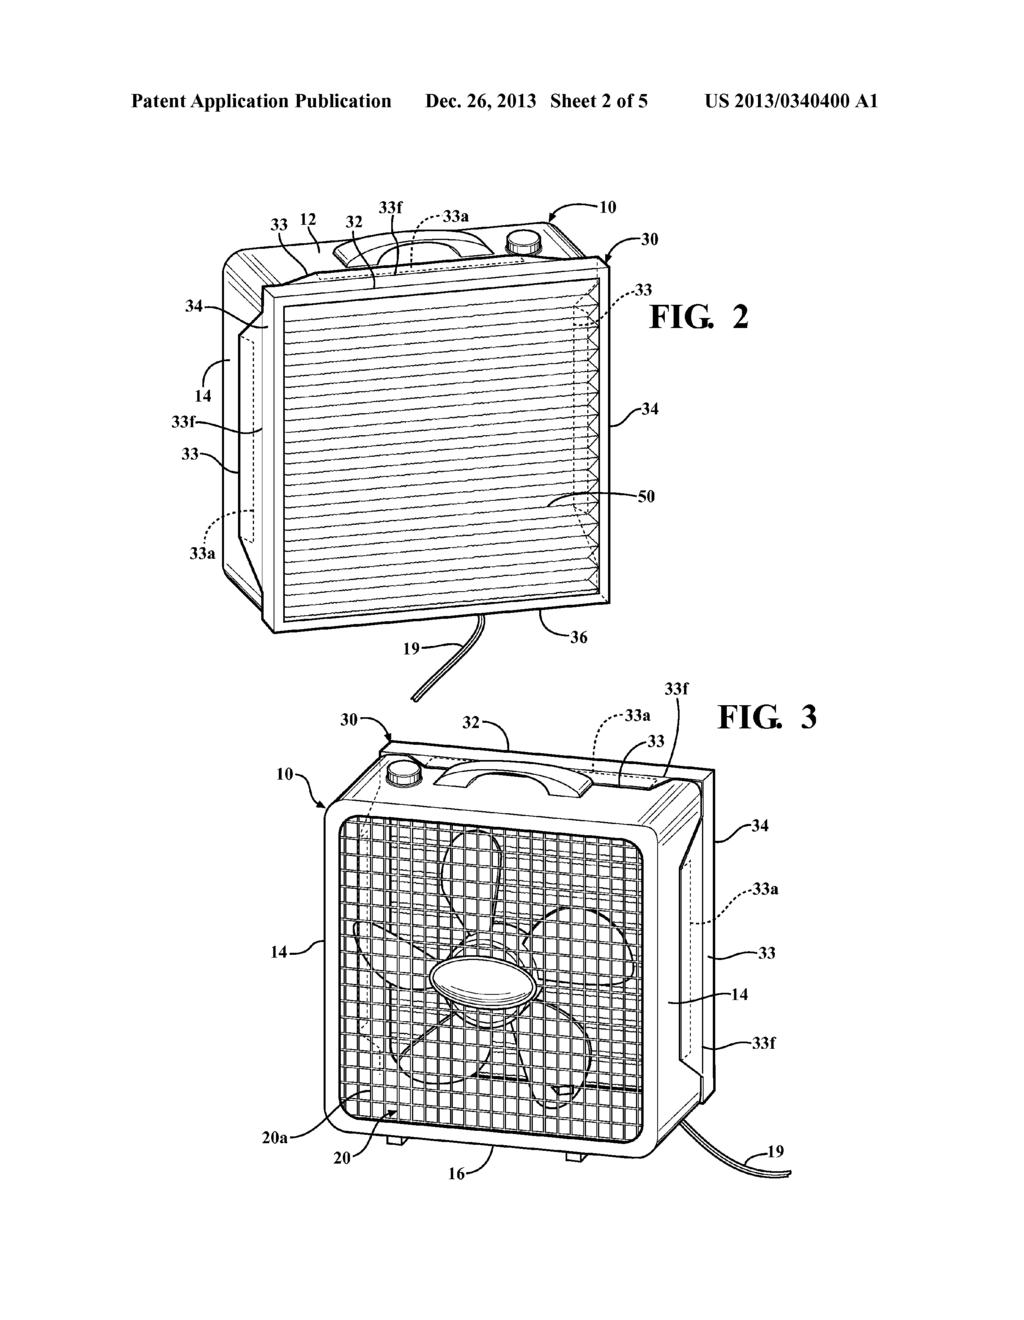 xh_2217] box fan diagram schematic wiring  iosco anth exxlu wedab vell waro hendil mohammedshrine librar wiring 101